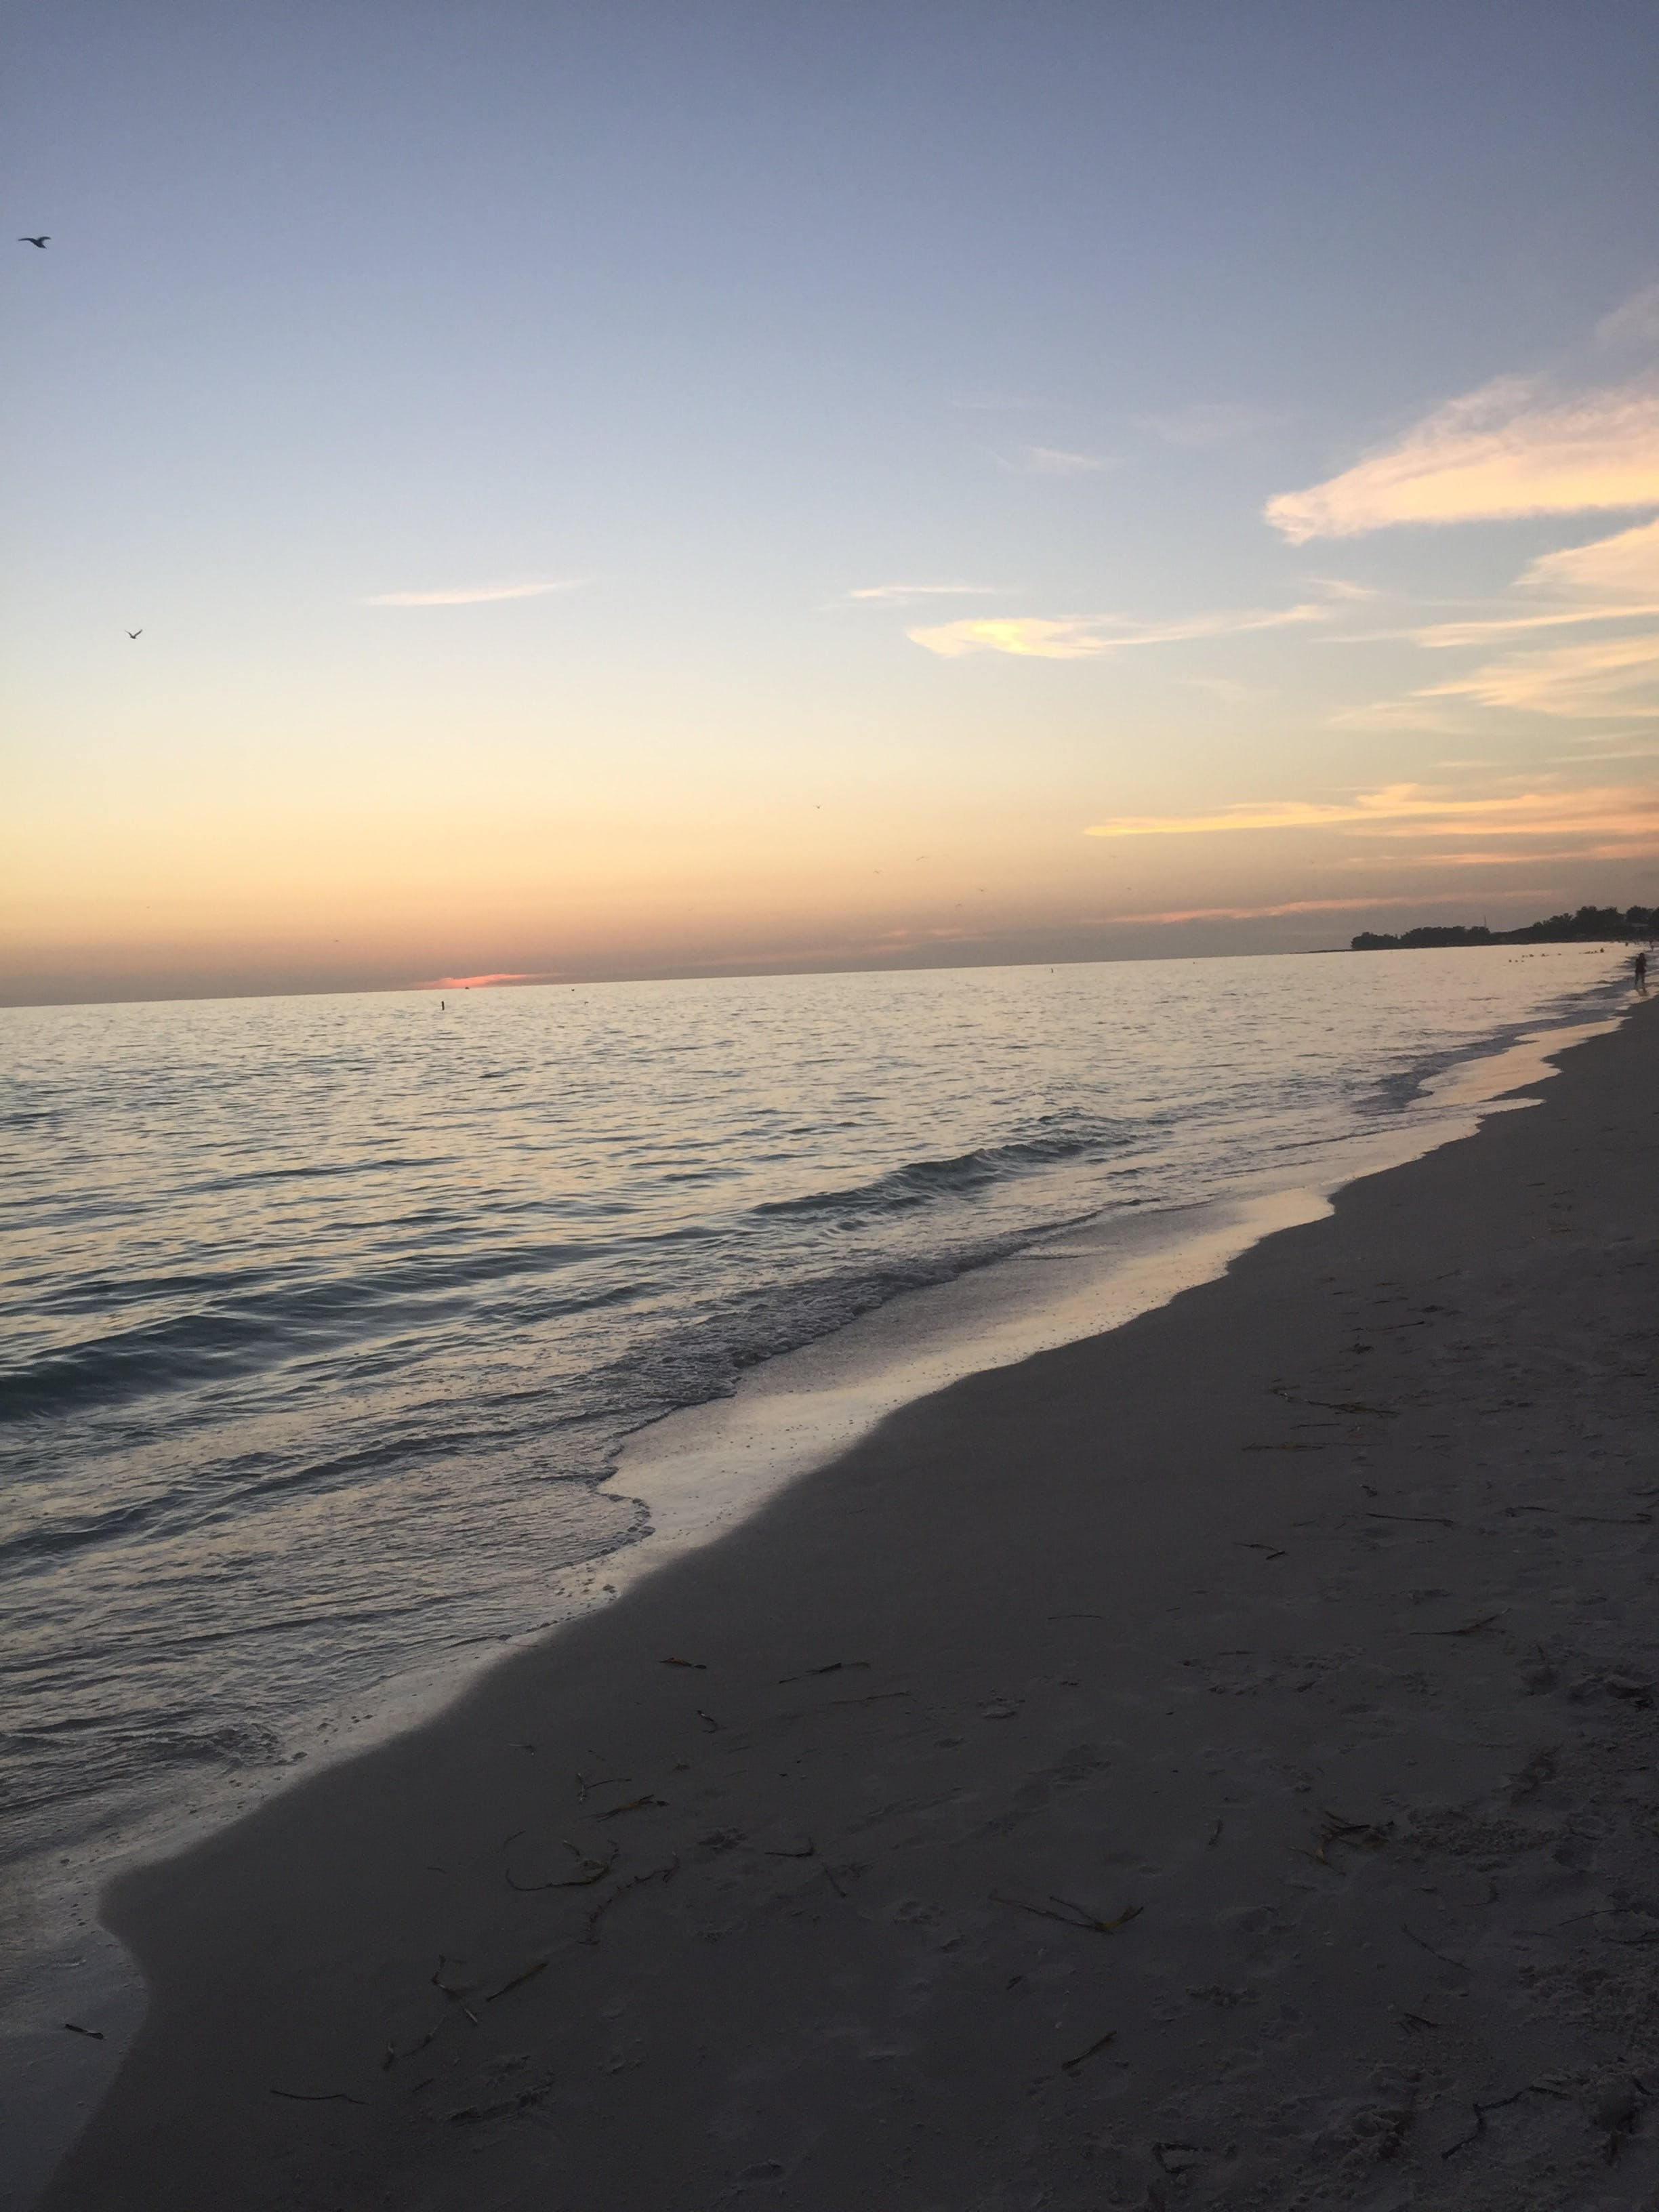 Free stock photo of beach, calm, ocean, peace